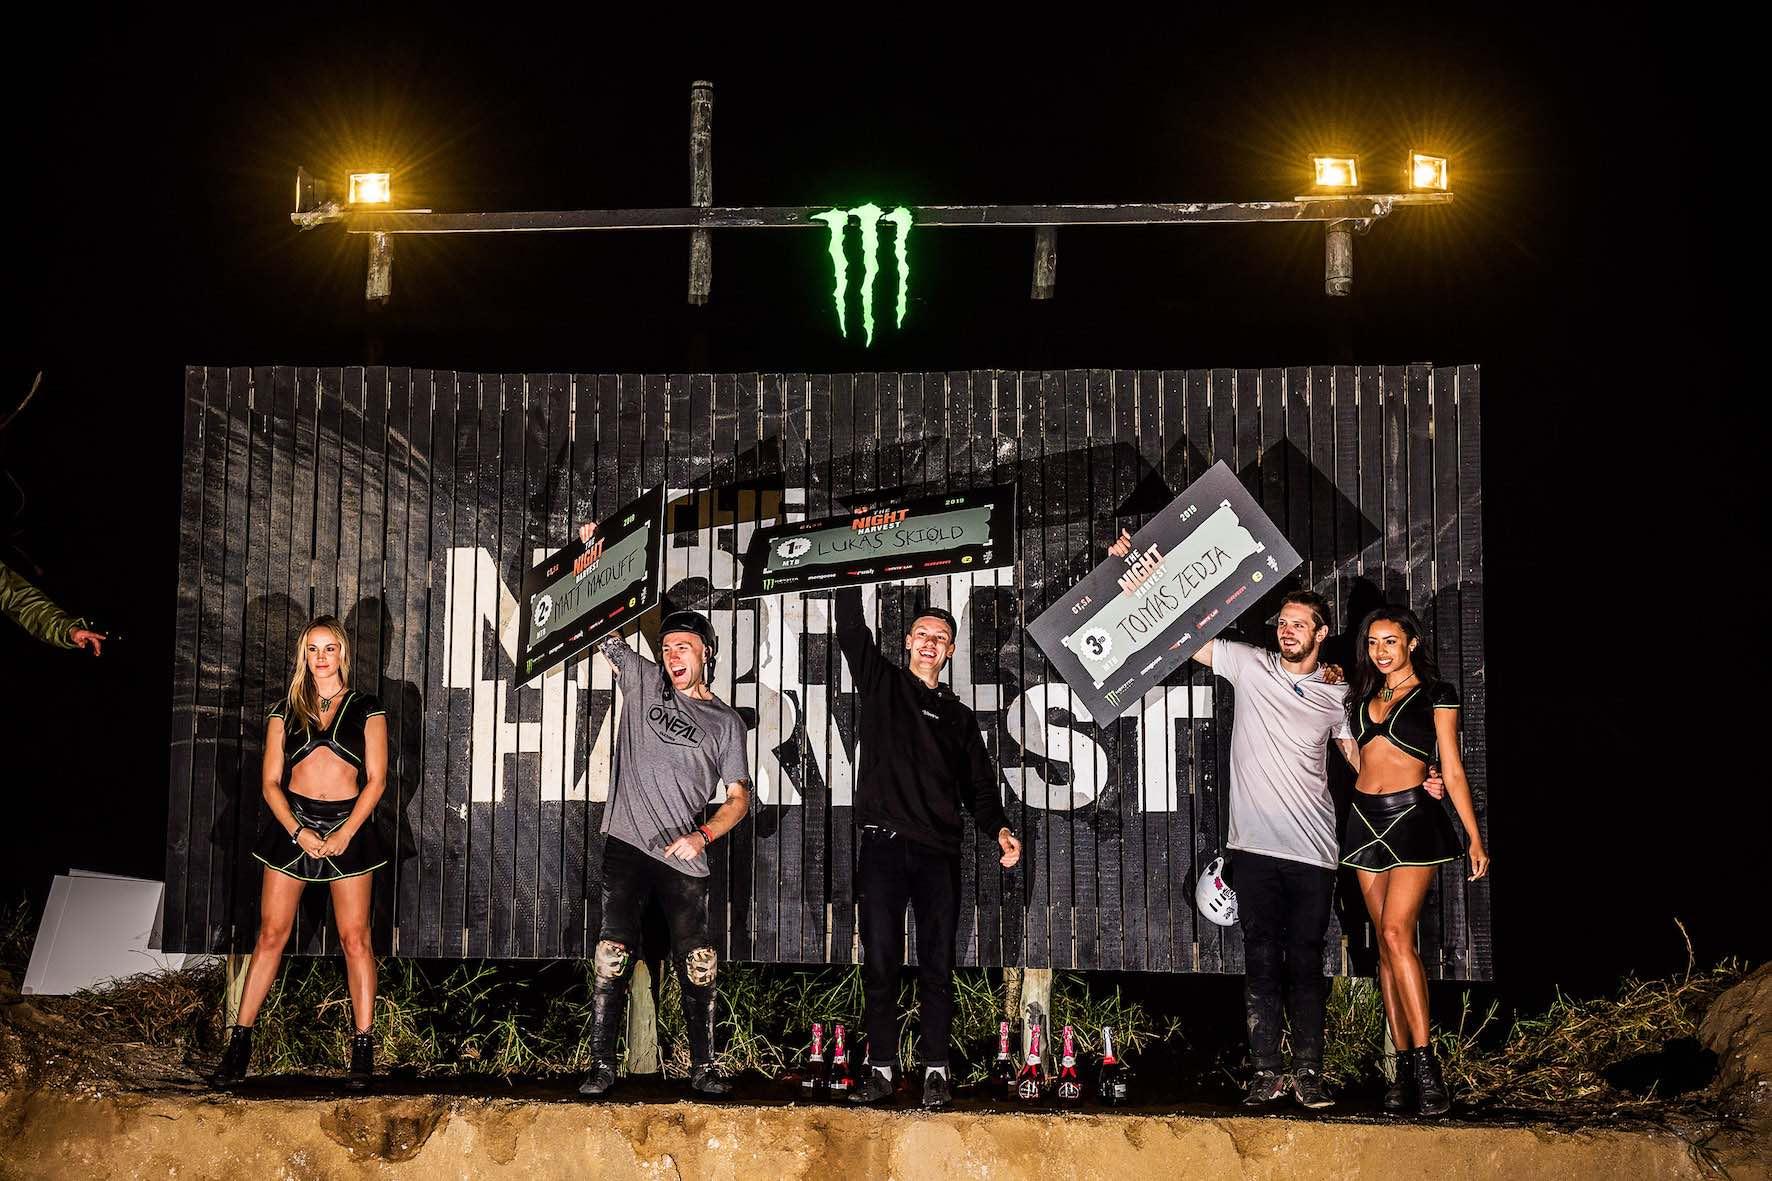 The Night Harvest 2019 MTB podium